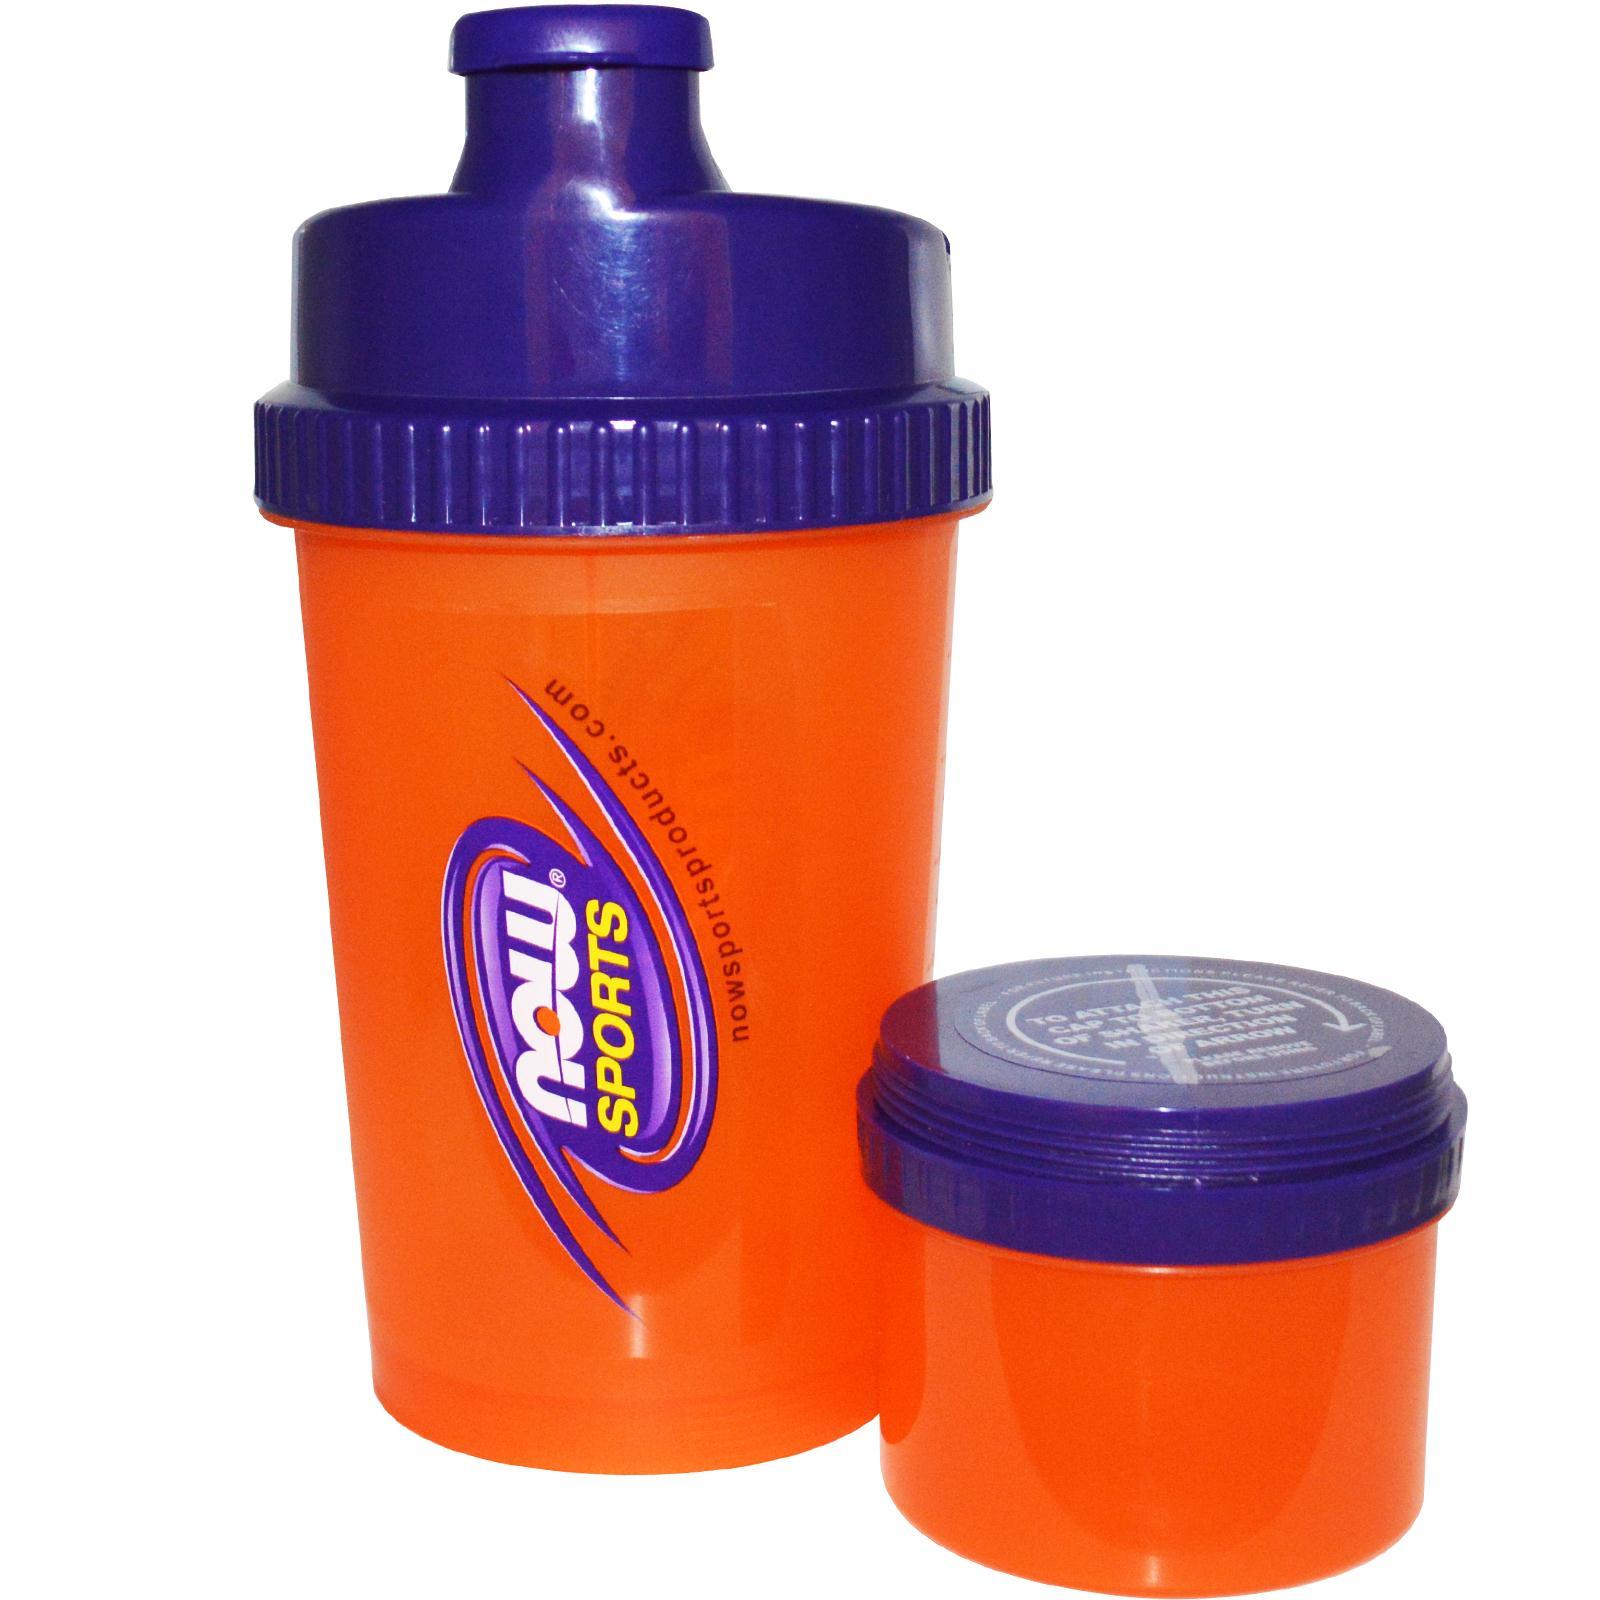 NOW Premium Shaker 3 In 1